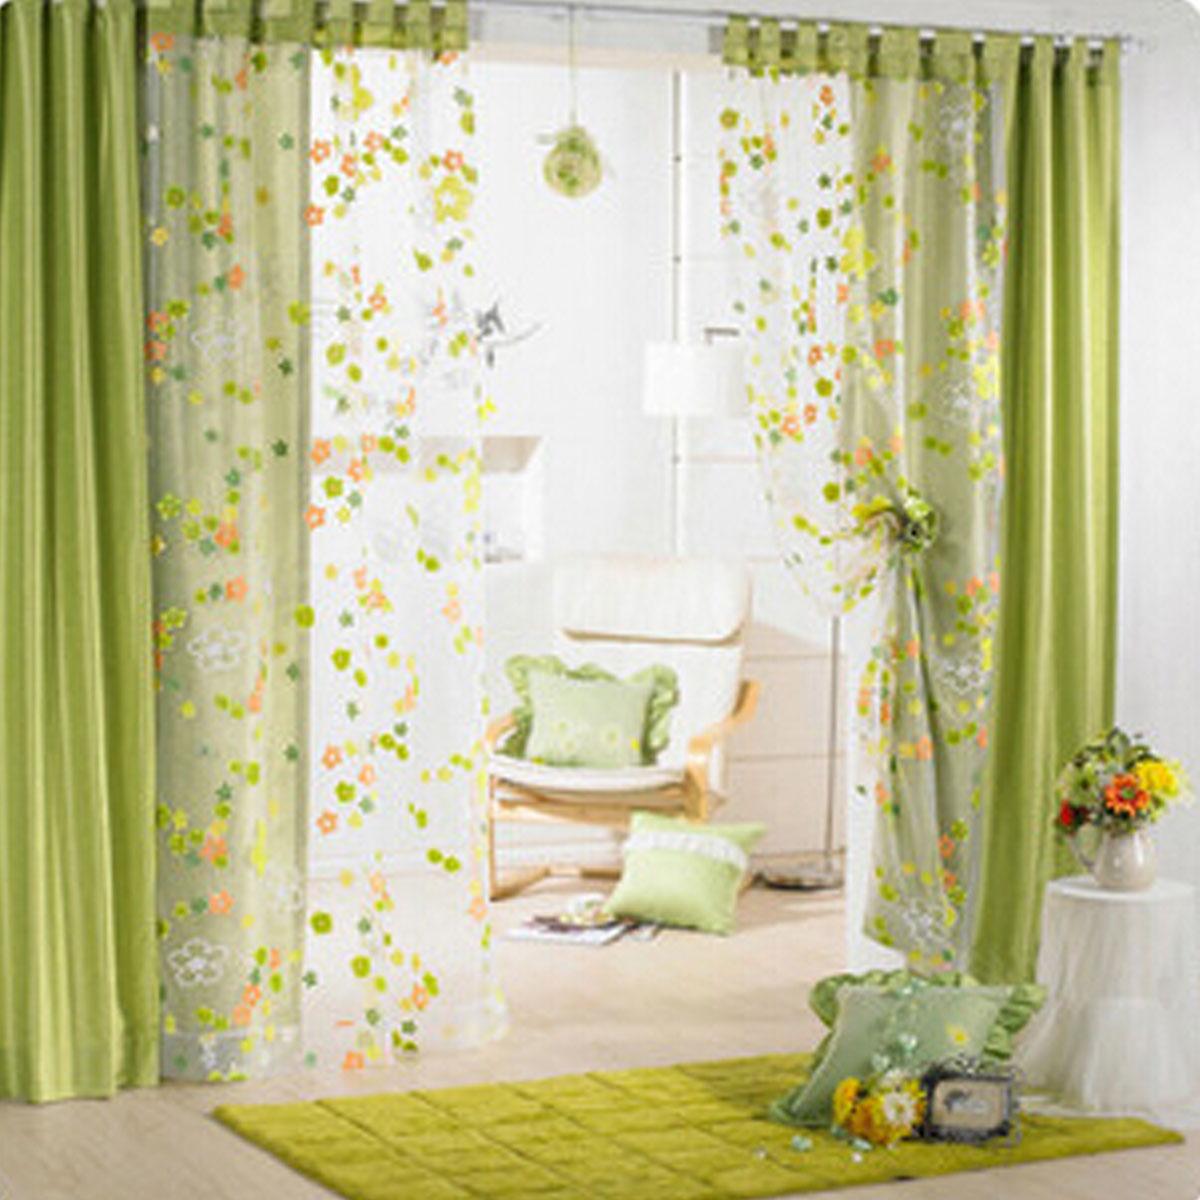 Flower floral door window curtain dr end 5 4 2018 10 15 am for Tende sala on line